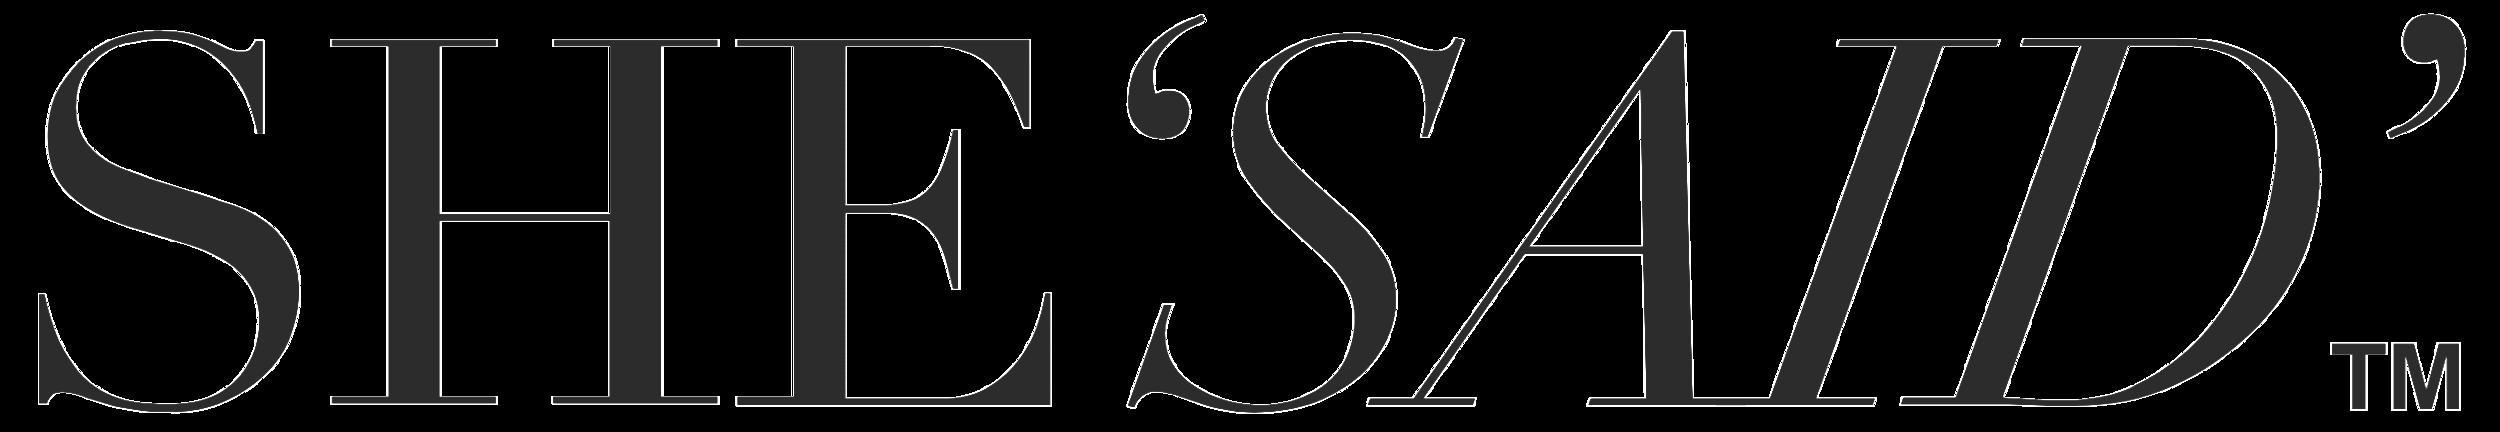 She'Said' logo